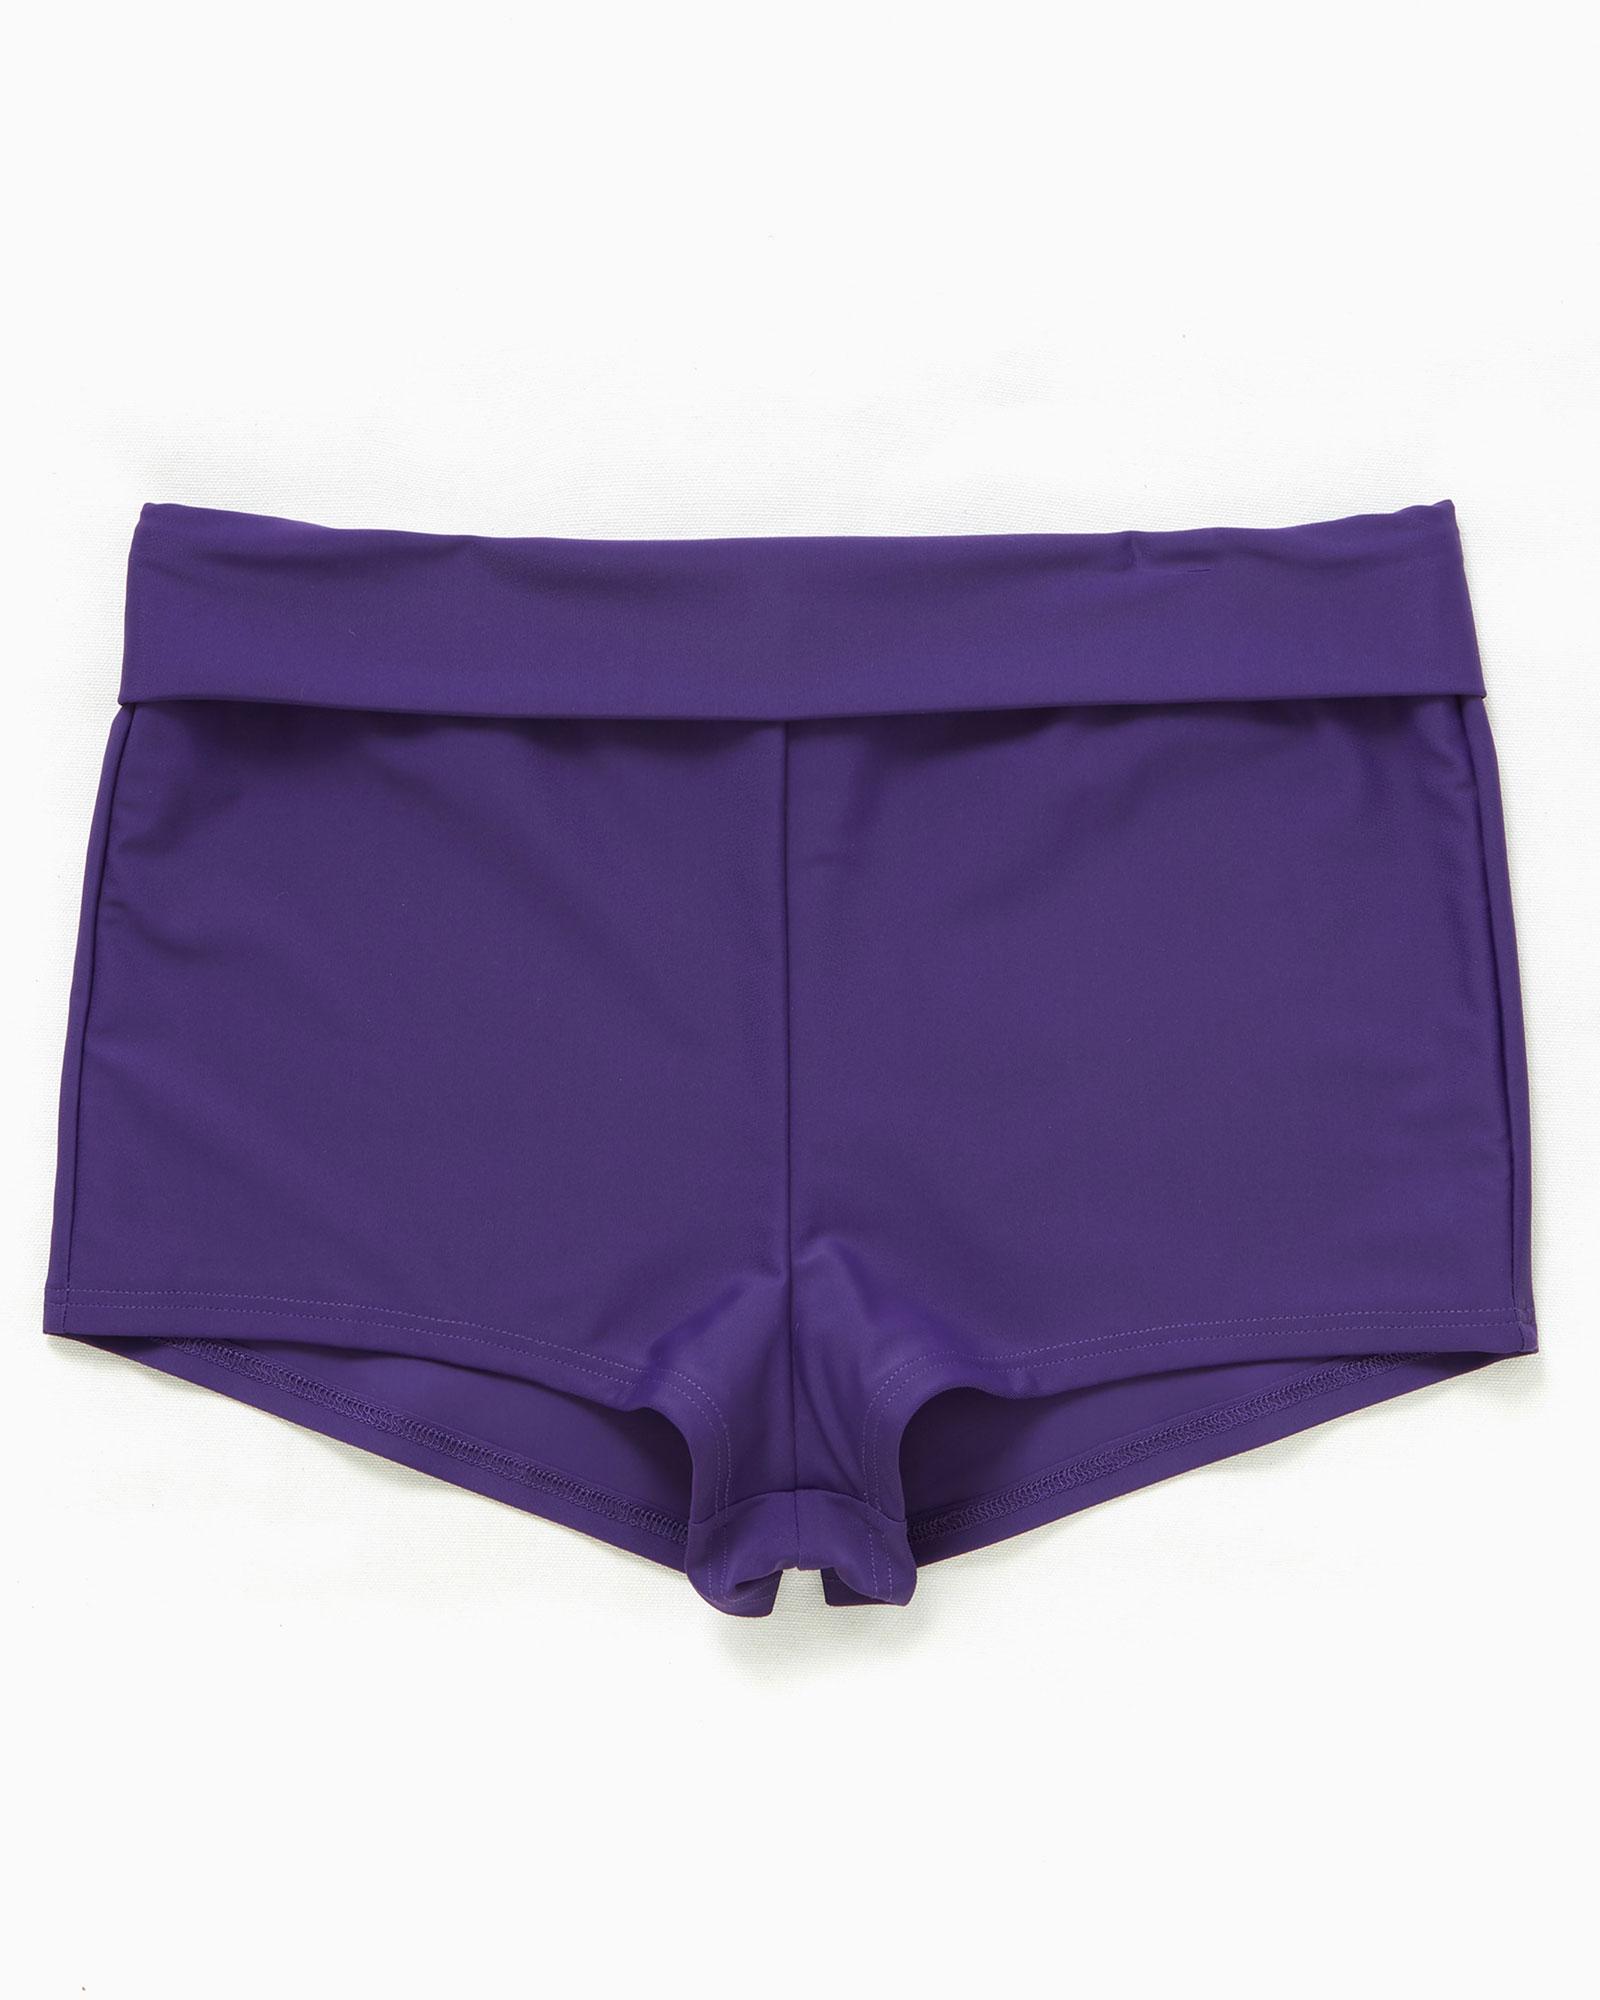 f43c427f71 Cotton Traders Women's Roll Top Tummy Control Short in Purple (Clothing  Swimwear) photo